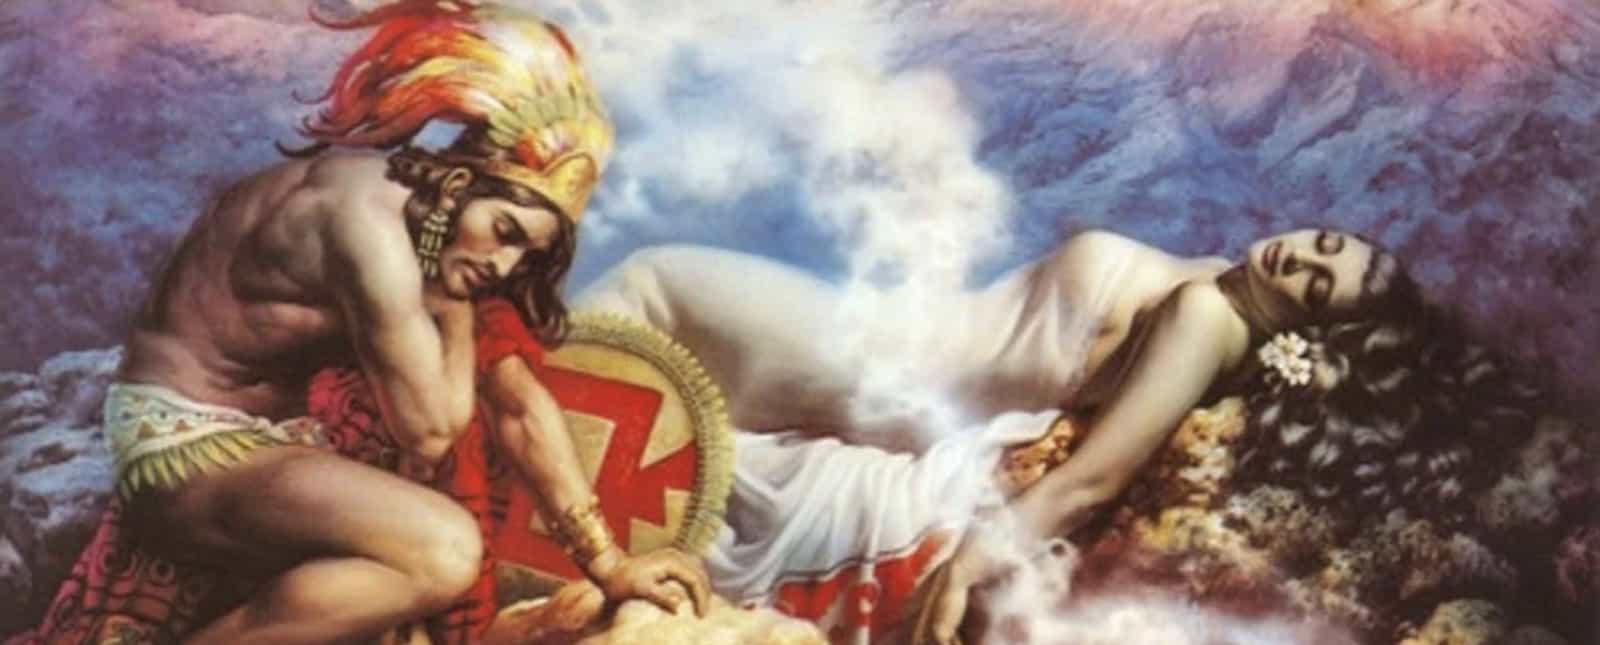 Leyendas prehispánicas que quizá no conocías - Historia